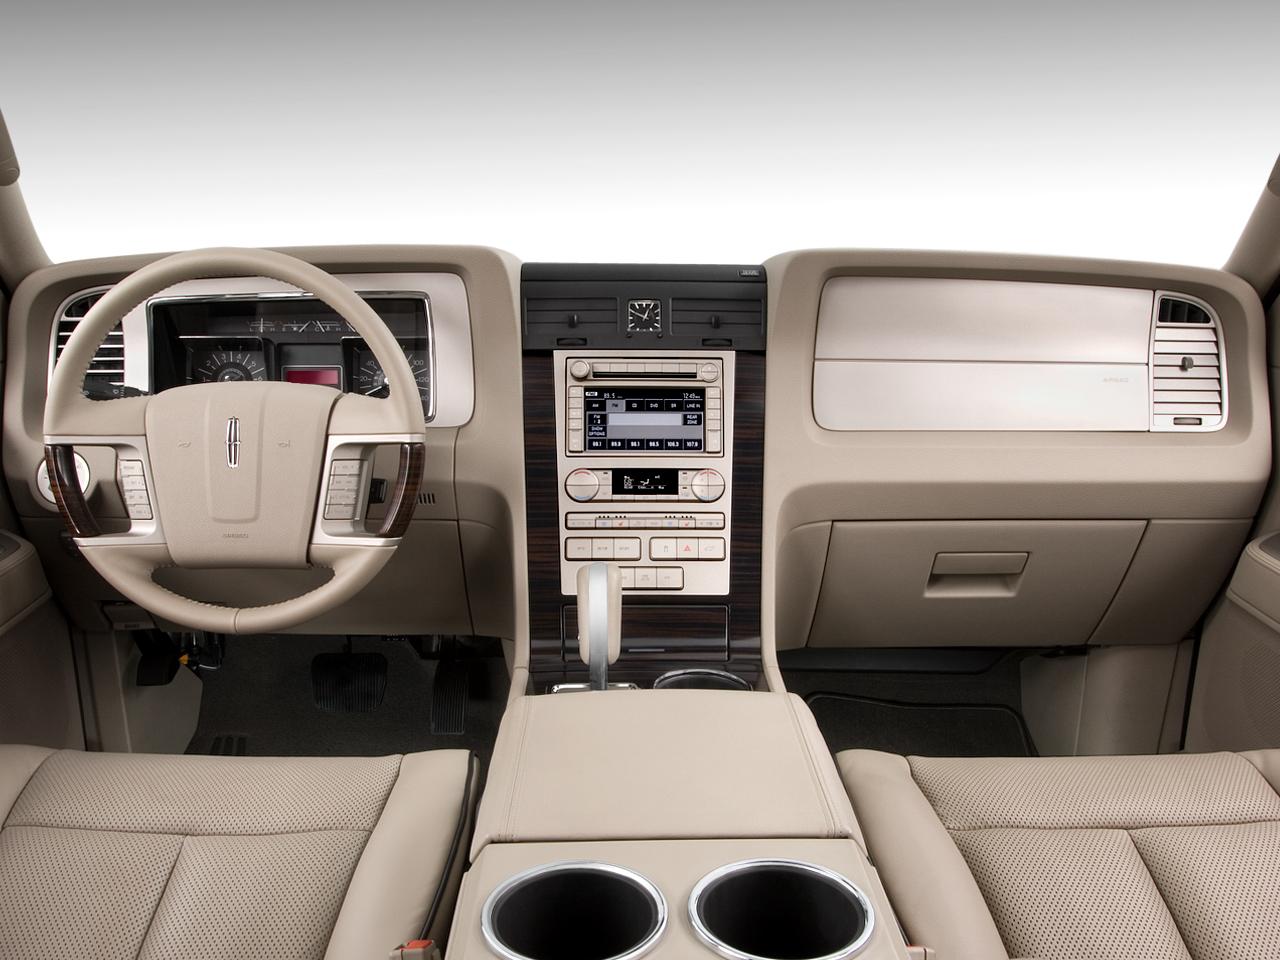 2010+lincoln+navigator+interior+pictures